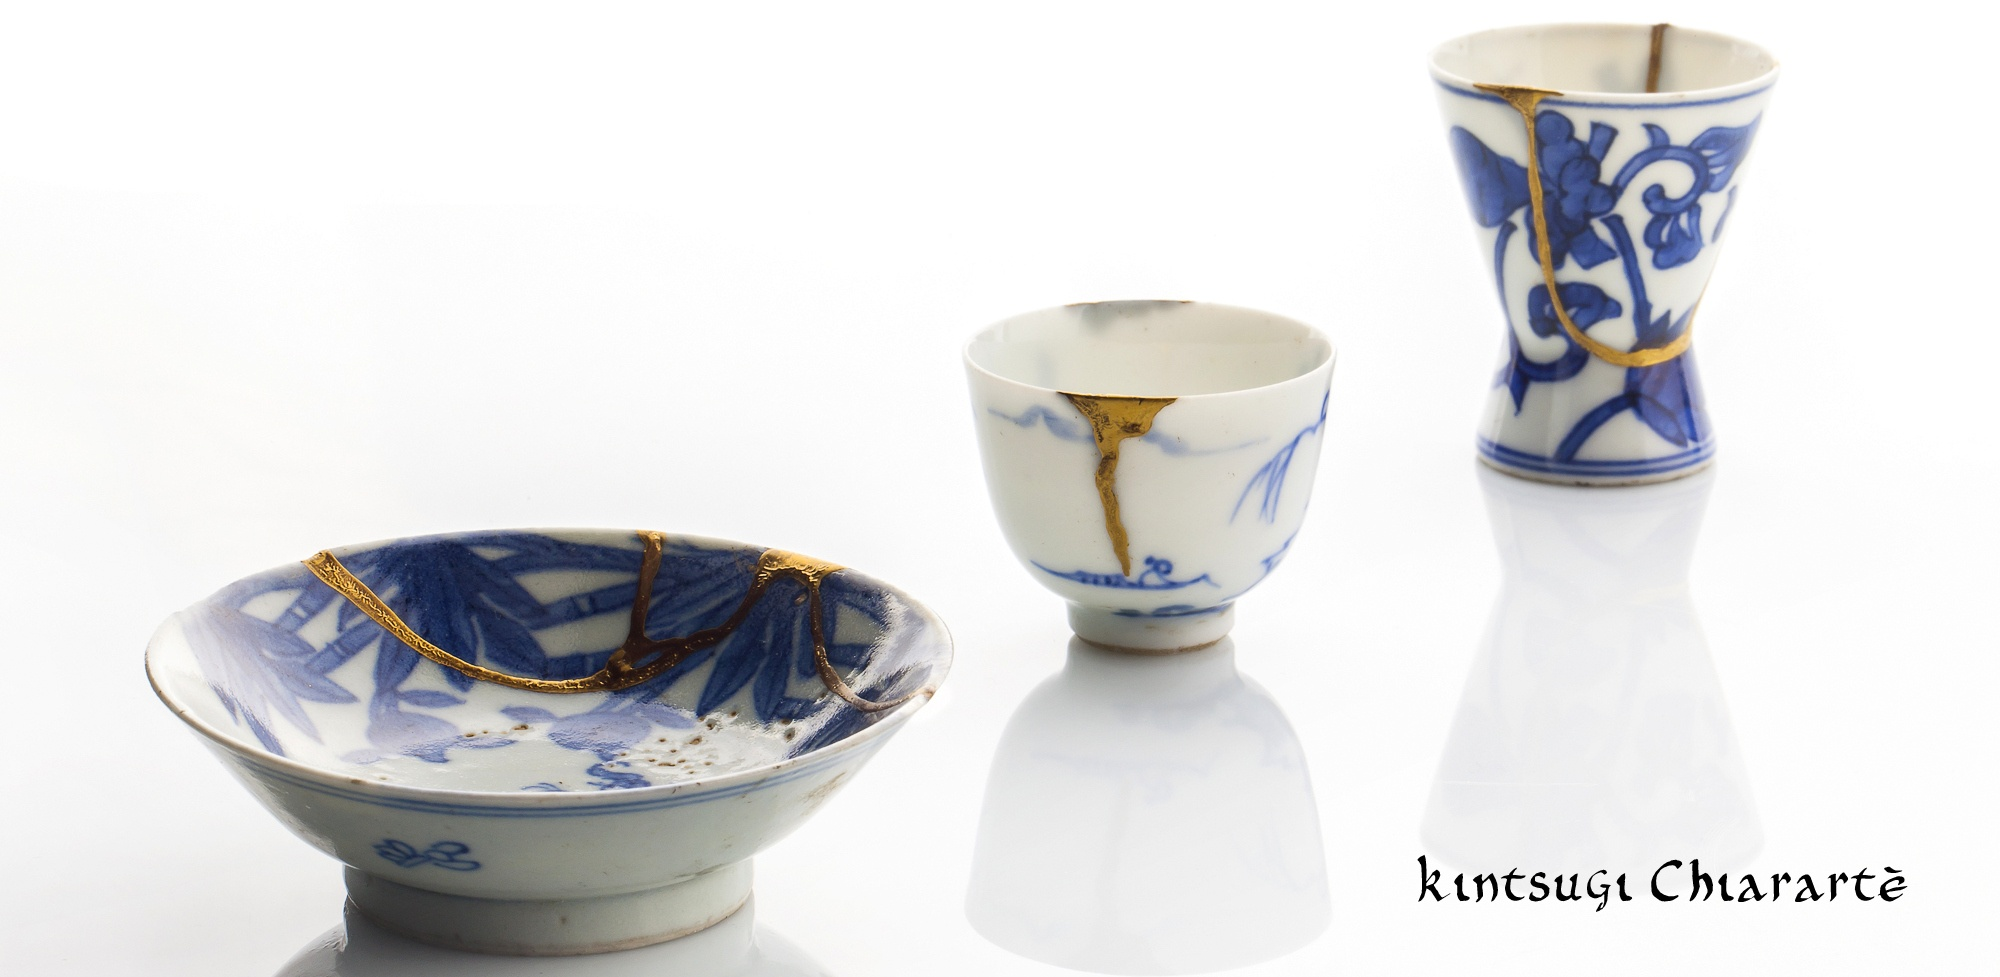 Arte Giapponese Del Kintsugi kintsugi: arte tradizionale, moderna e metafora - kintsugi